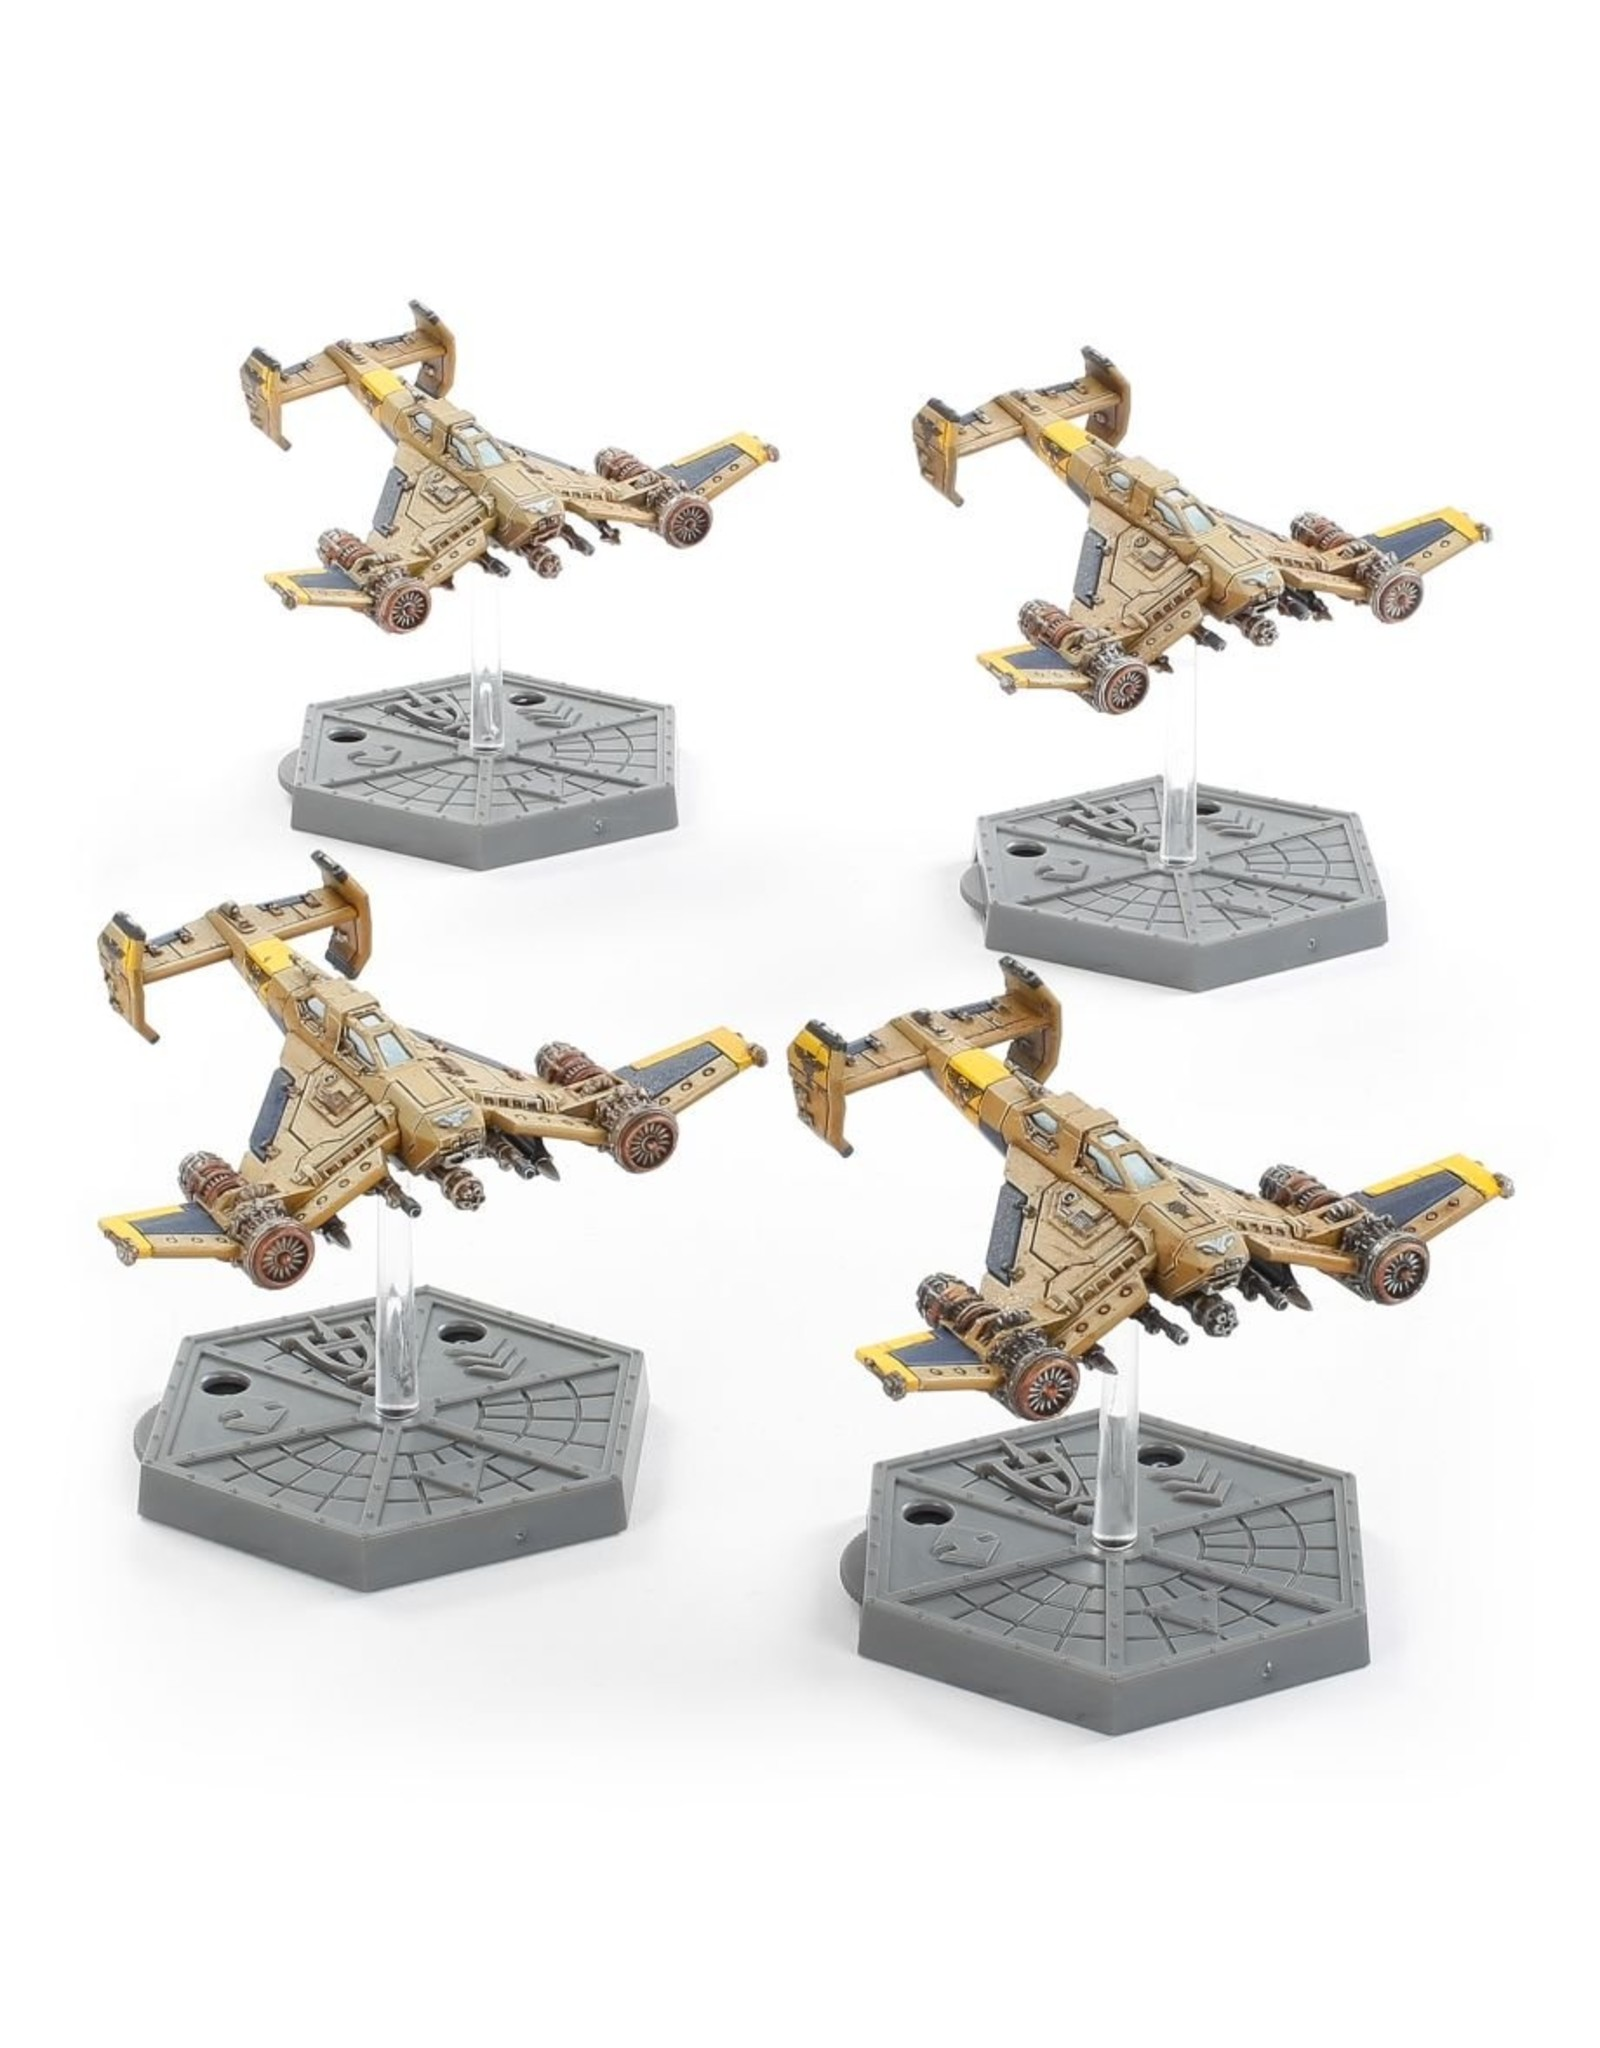 Games Workshop Aero/Imperialis: Imperial Navy Avenger Strike Fighter